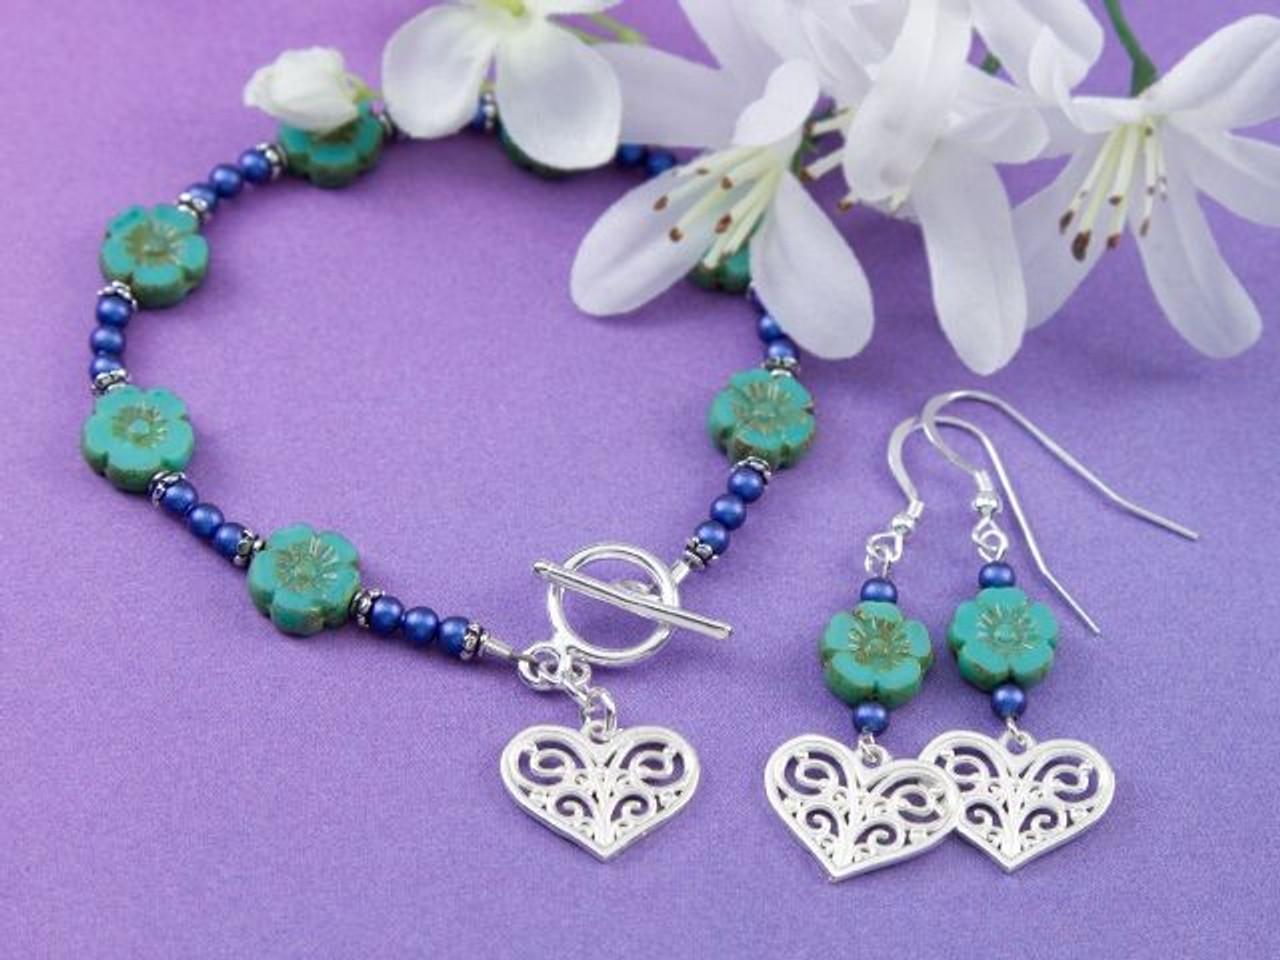 GiftJewelryShop Blue Christmas Snowflake Blue Zircon Crystal December Birthstone Flower Dangle Charm Bracelets